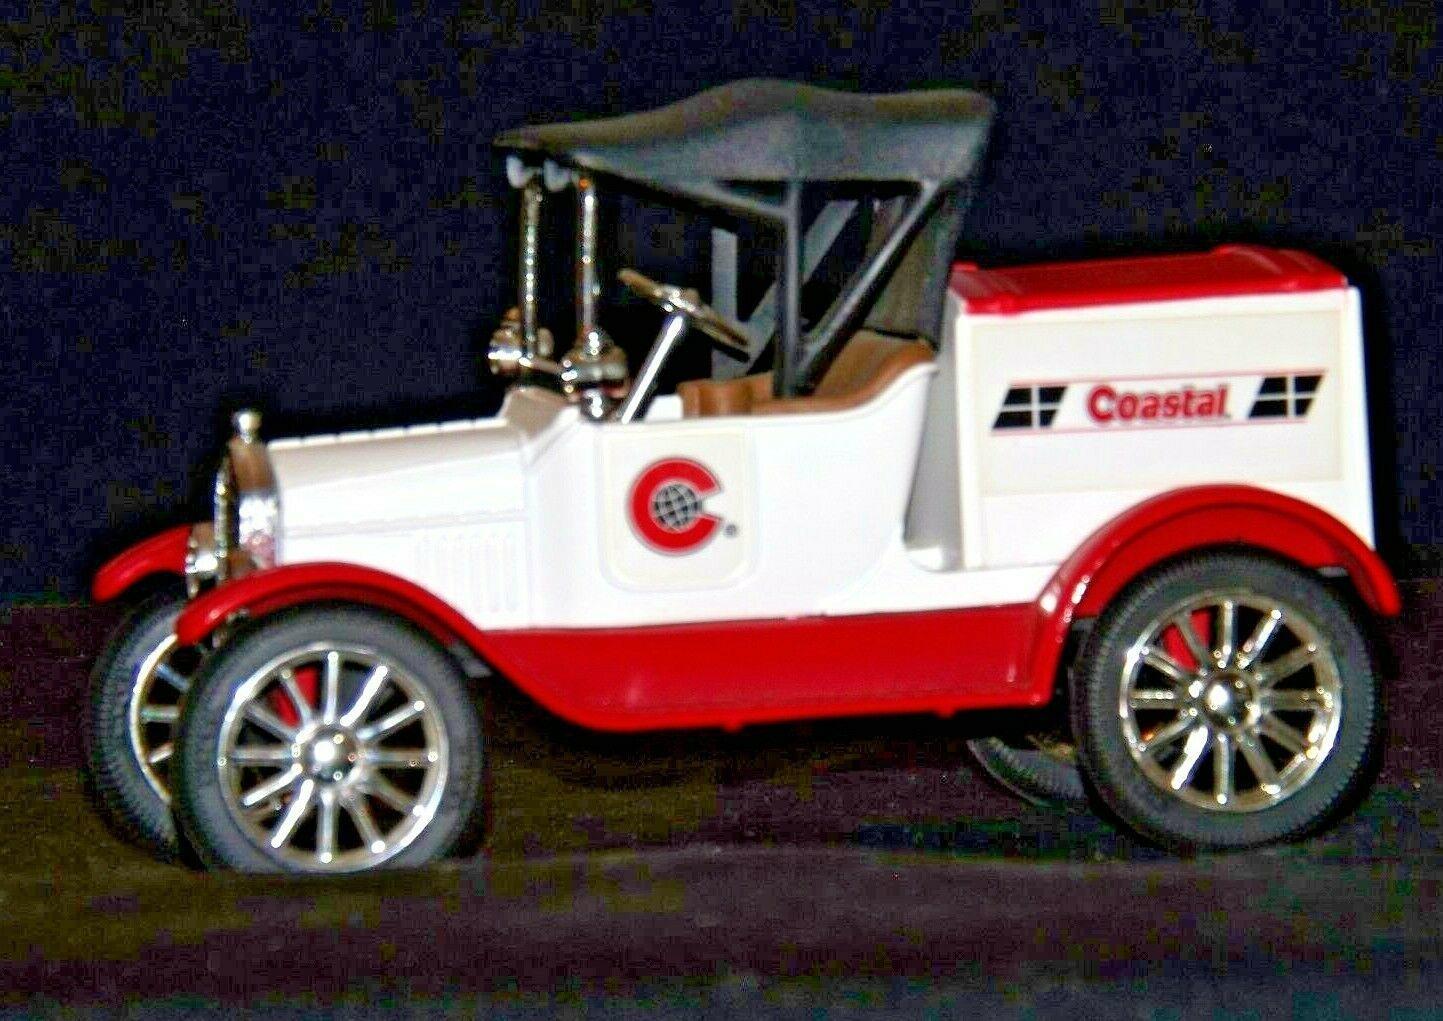 "ERTL Coastal Ford 1918 Replica Die-cast Model ""T"" Runabout Bank AA19-1638 Vint"